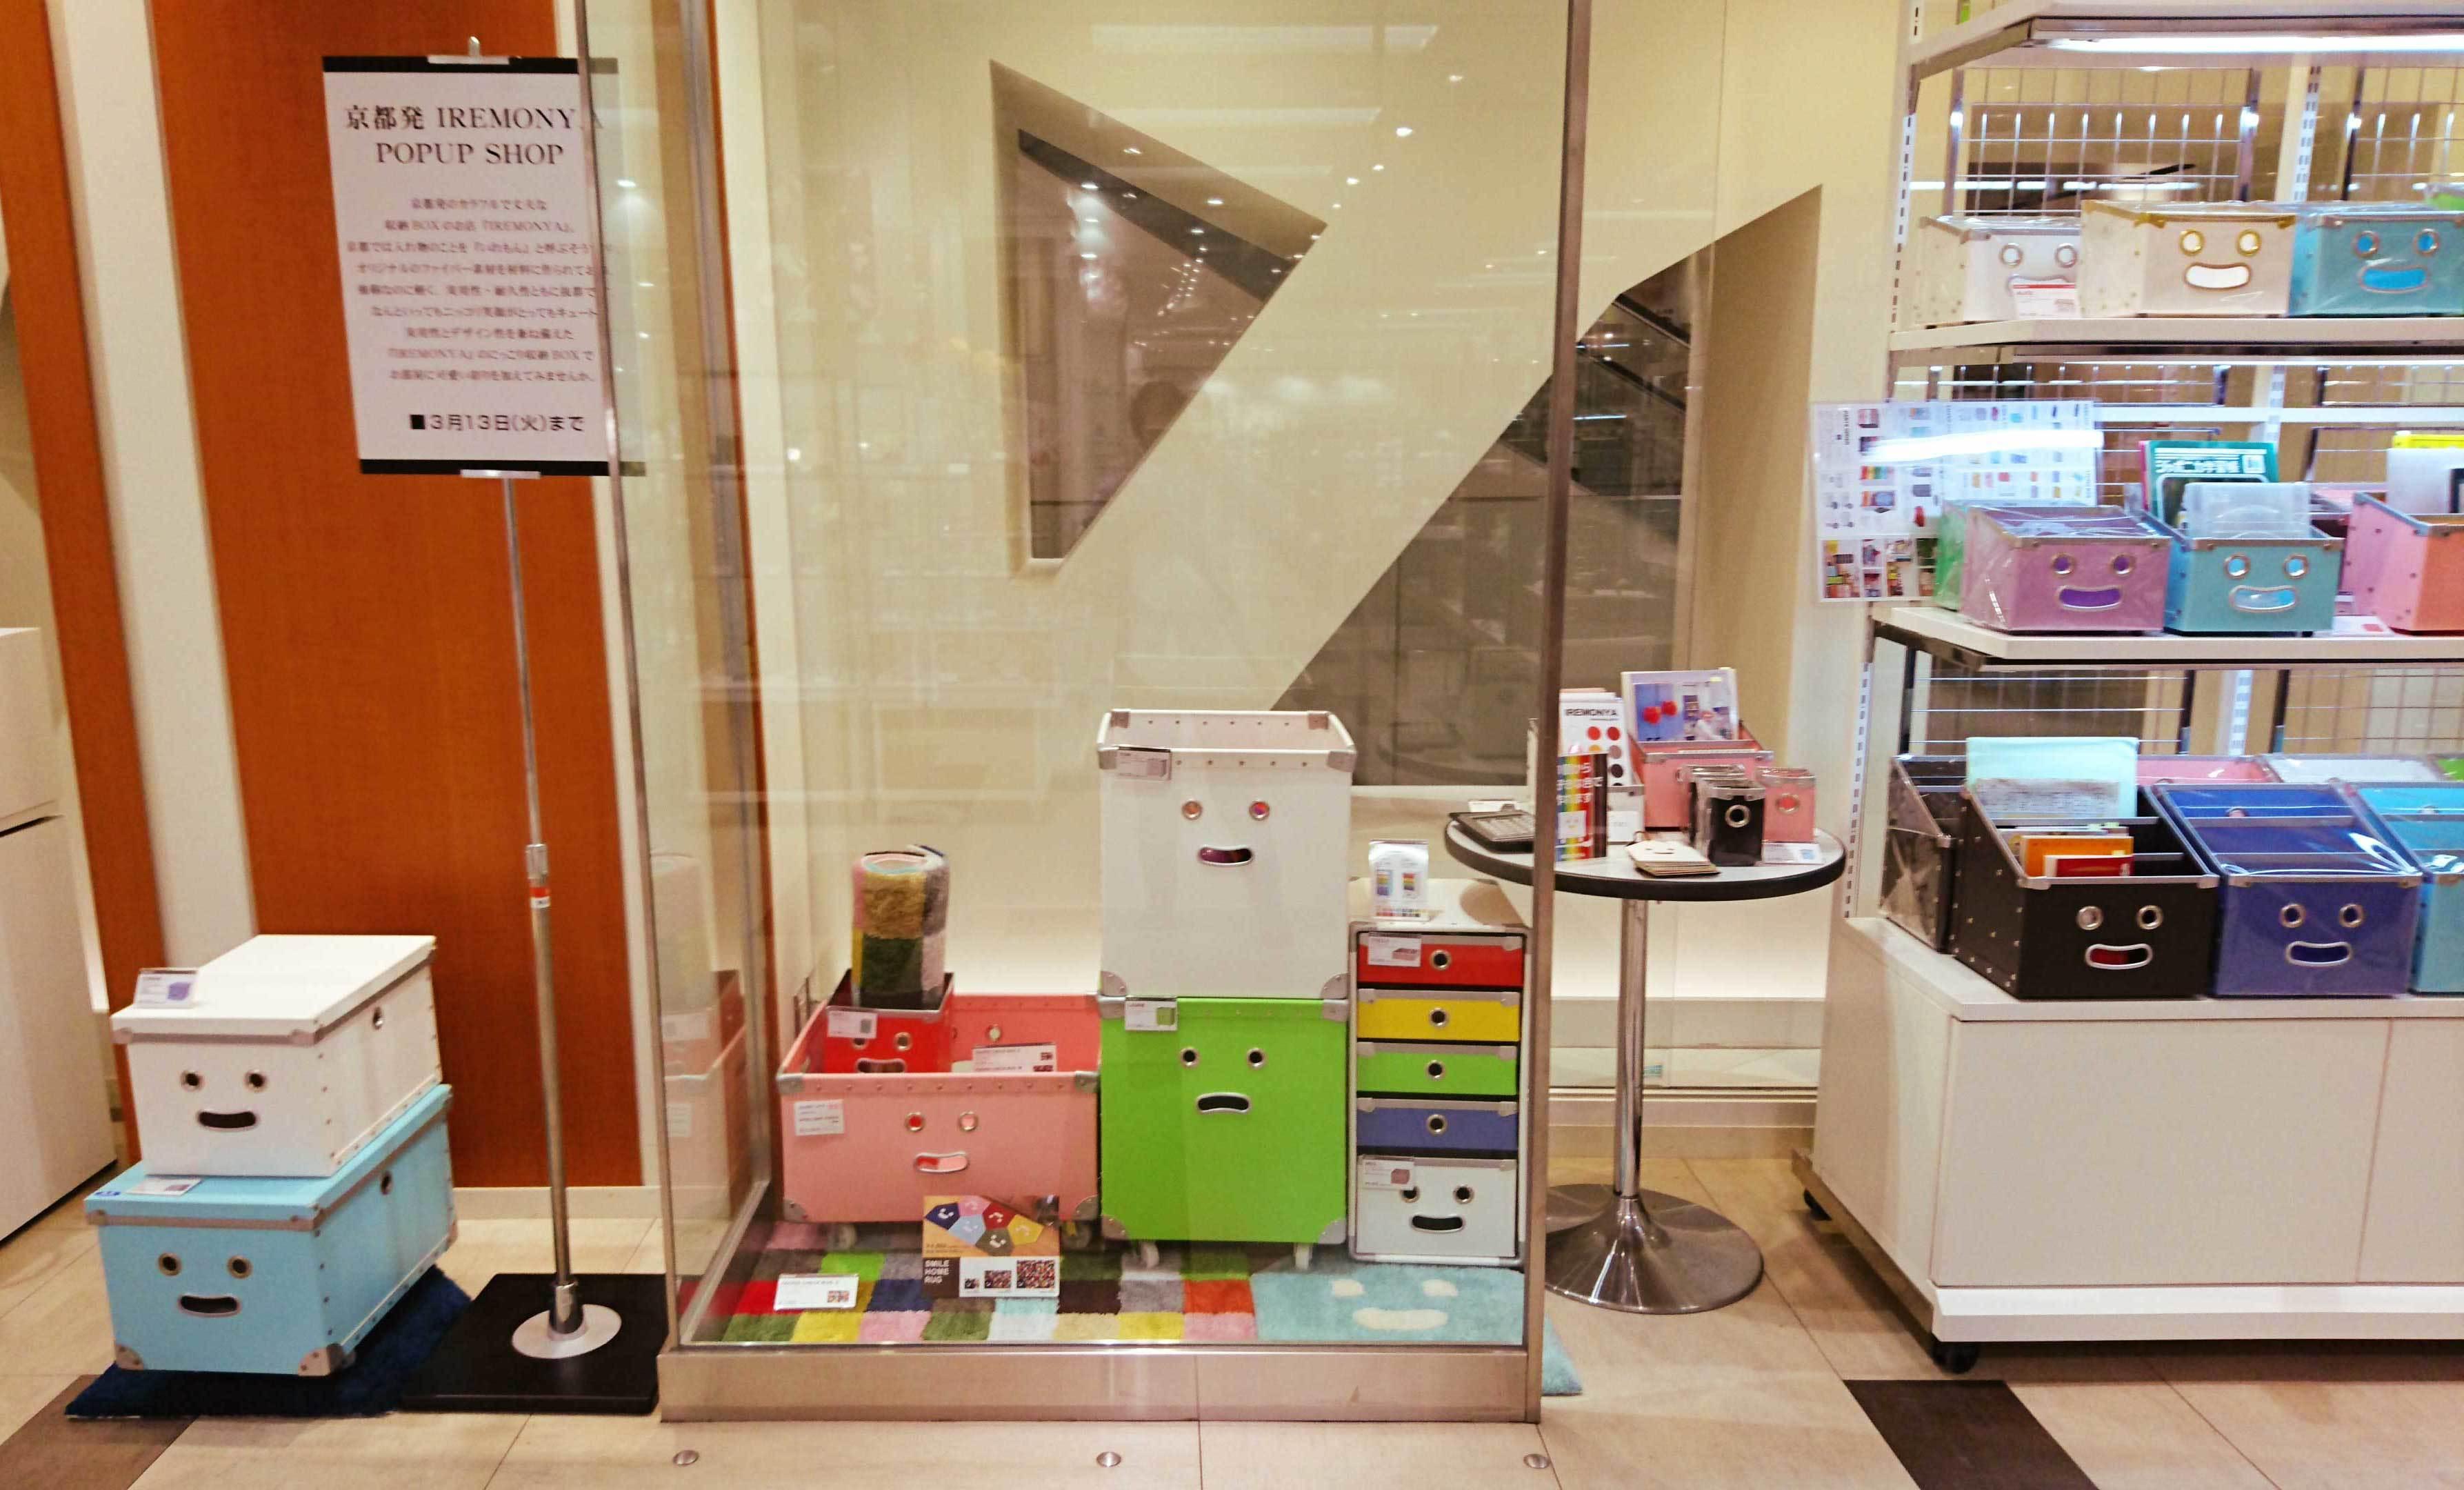 IREMONYA at 名古屋栄三越「スマイルボックスフェア」情報vol.2_b0087378_18264689.jpg